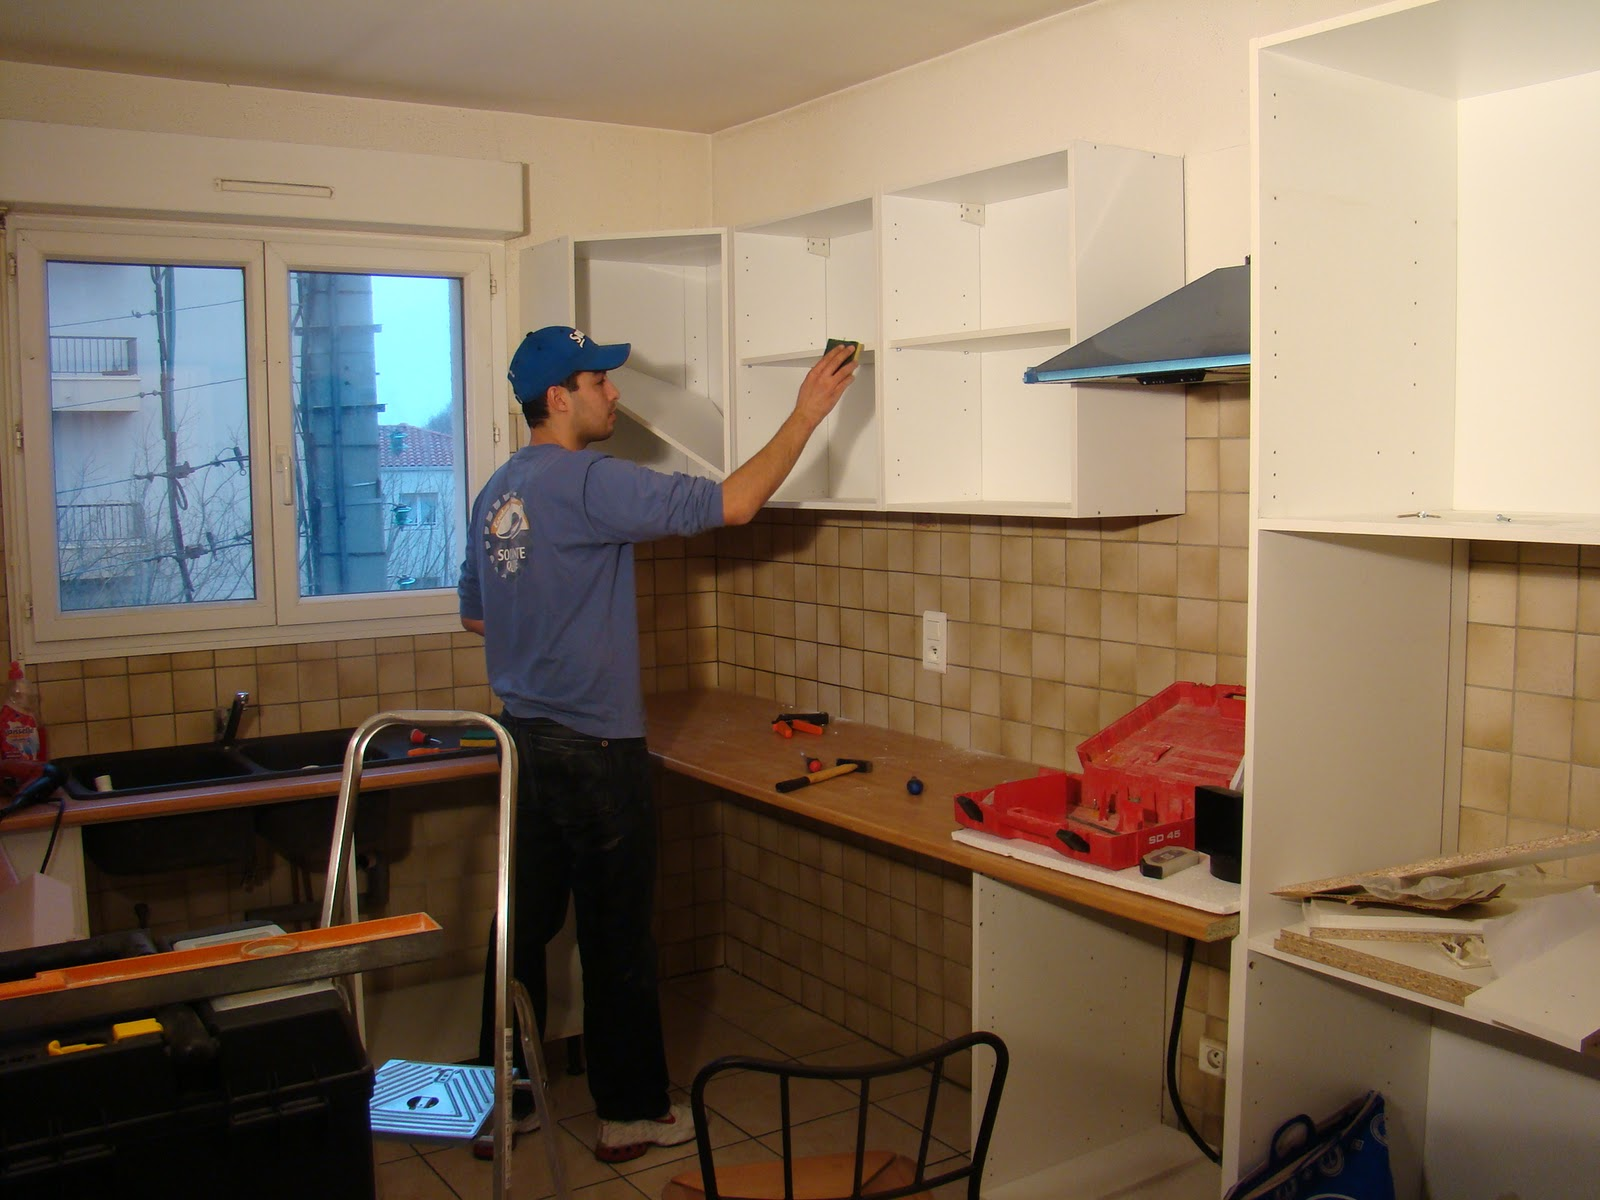 pose d 39 une cuisine am nag e. Black Bedroom Furniture Sets. Home Design Ideas